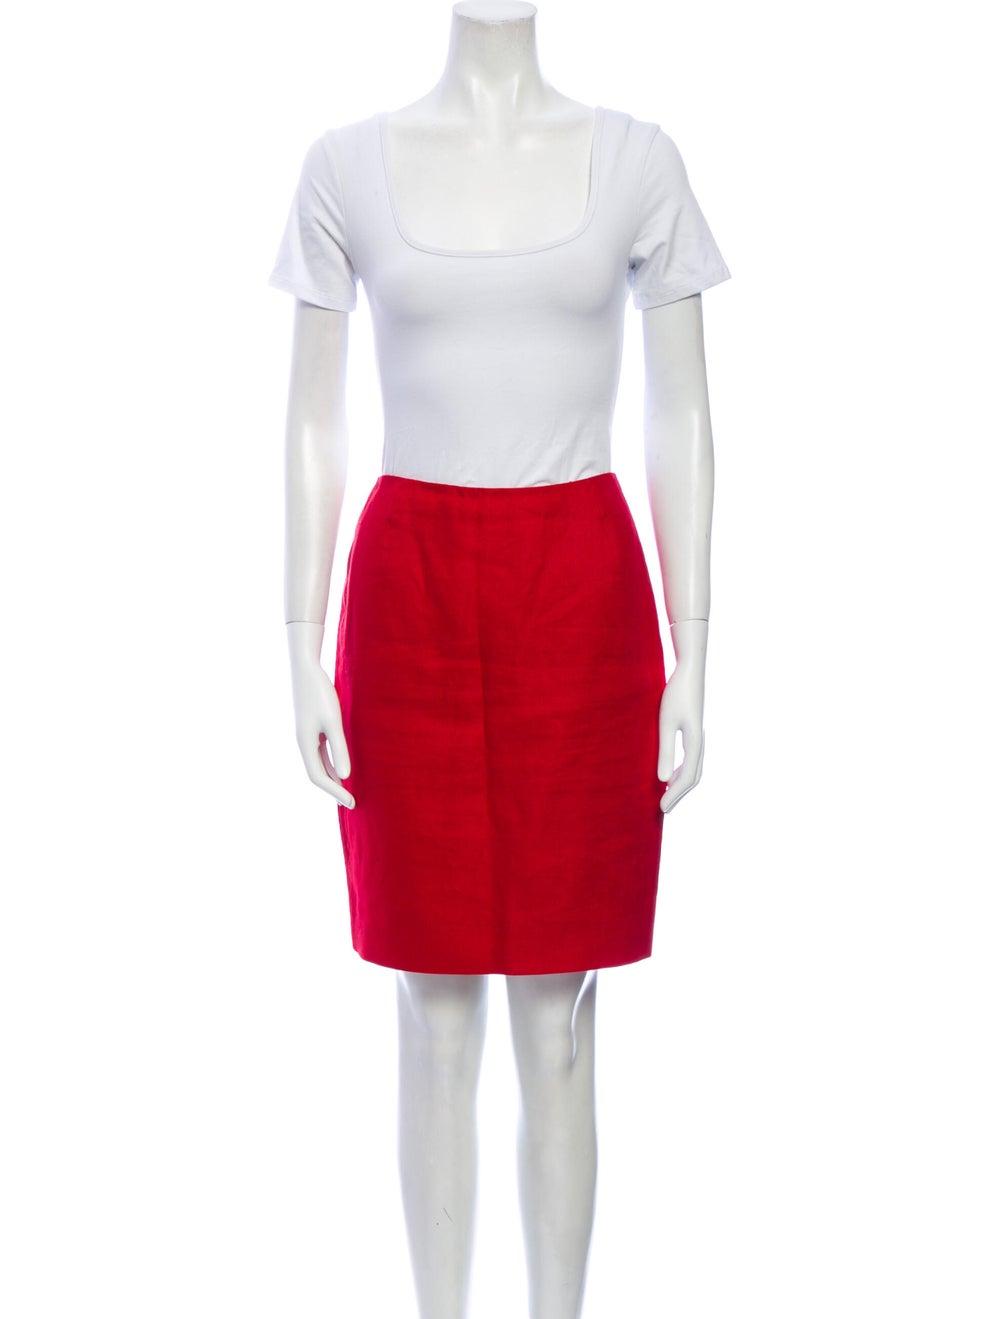 Michael Kors Linen Skirt Suit Red - image 4